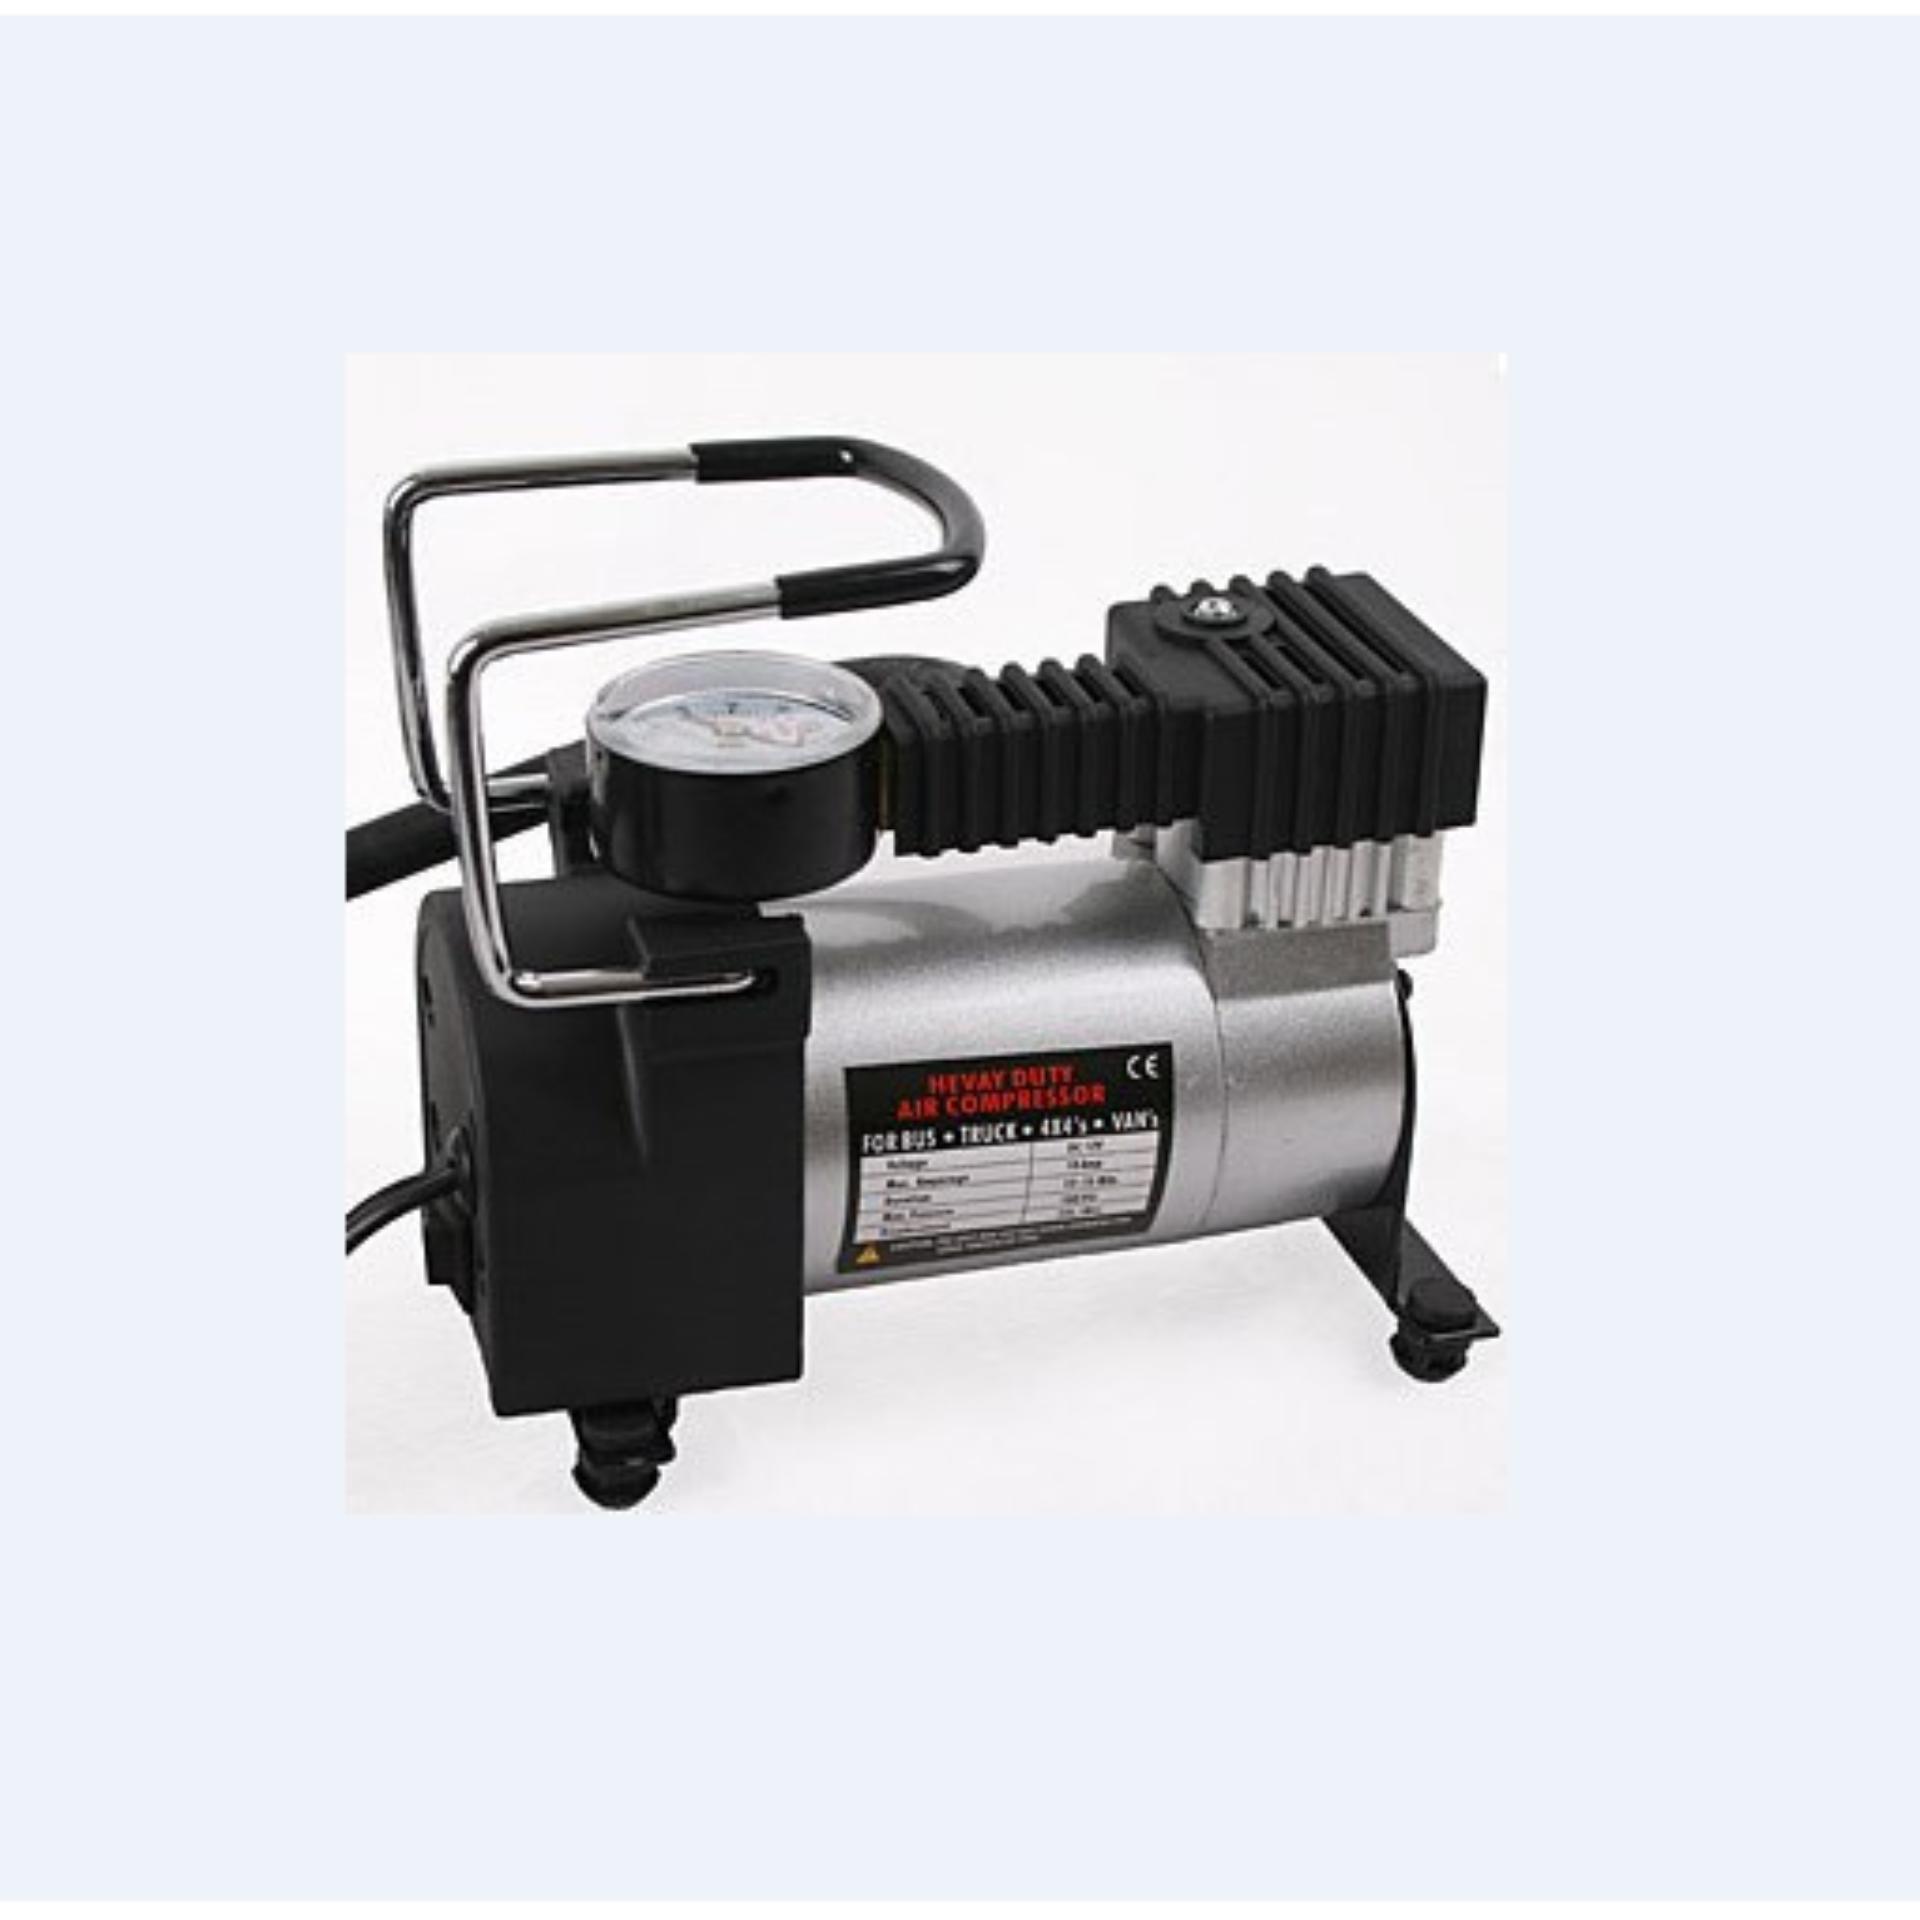 ... Heavy Duty Air Compressor pompa ban mobil motor mainan anak bola ...